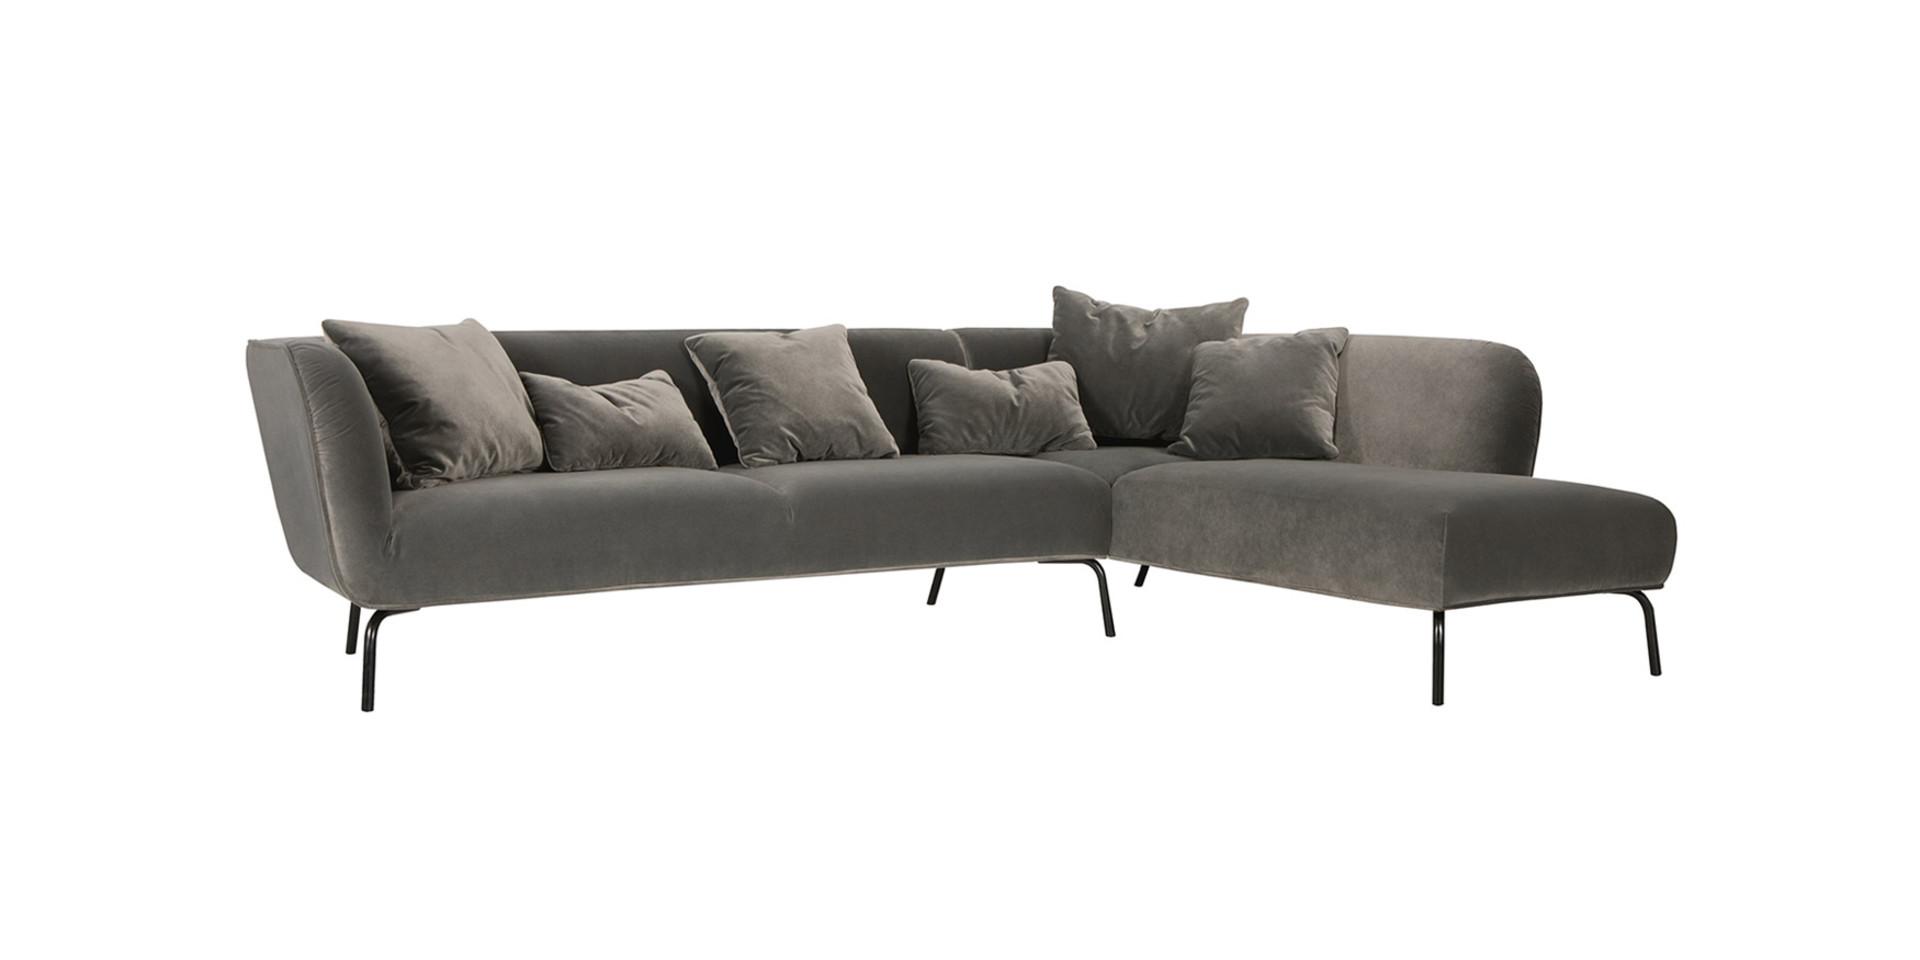 sits-selma-angle-set1_classic_velvet5_grey_2